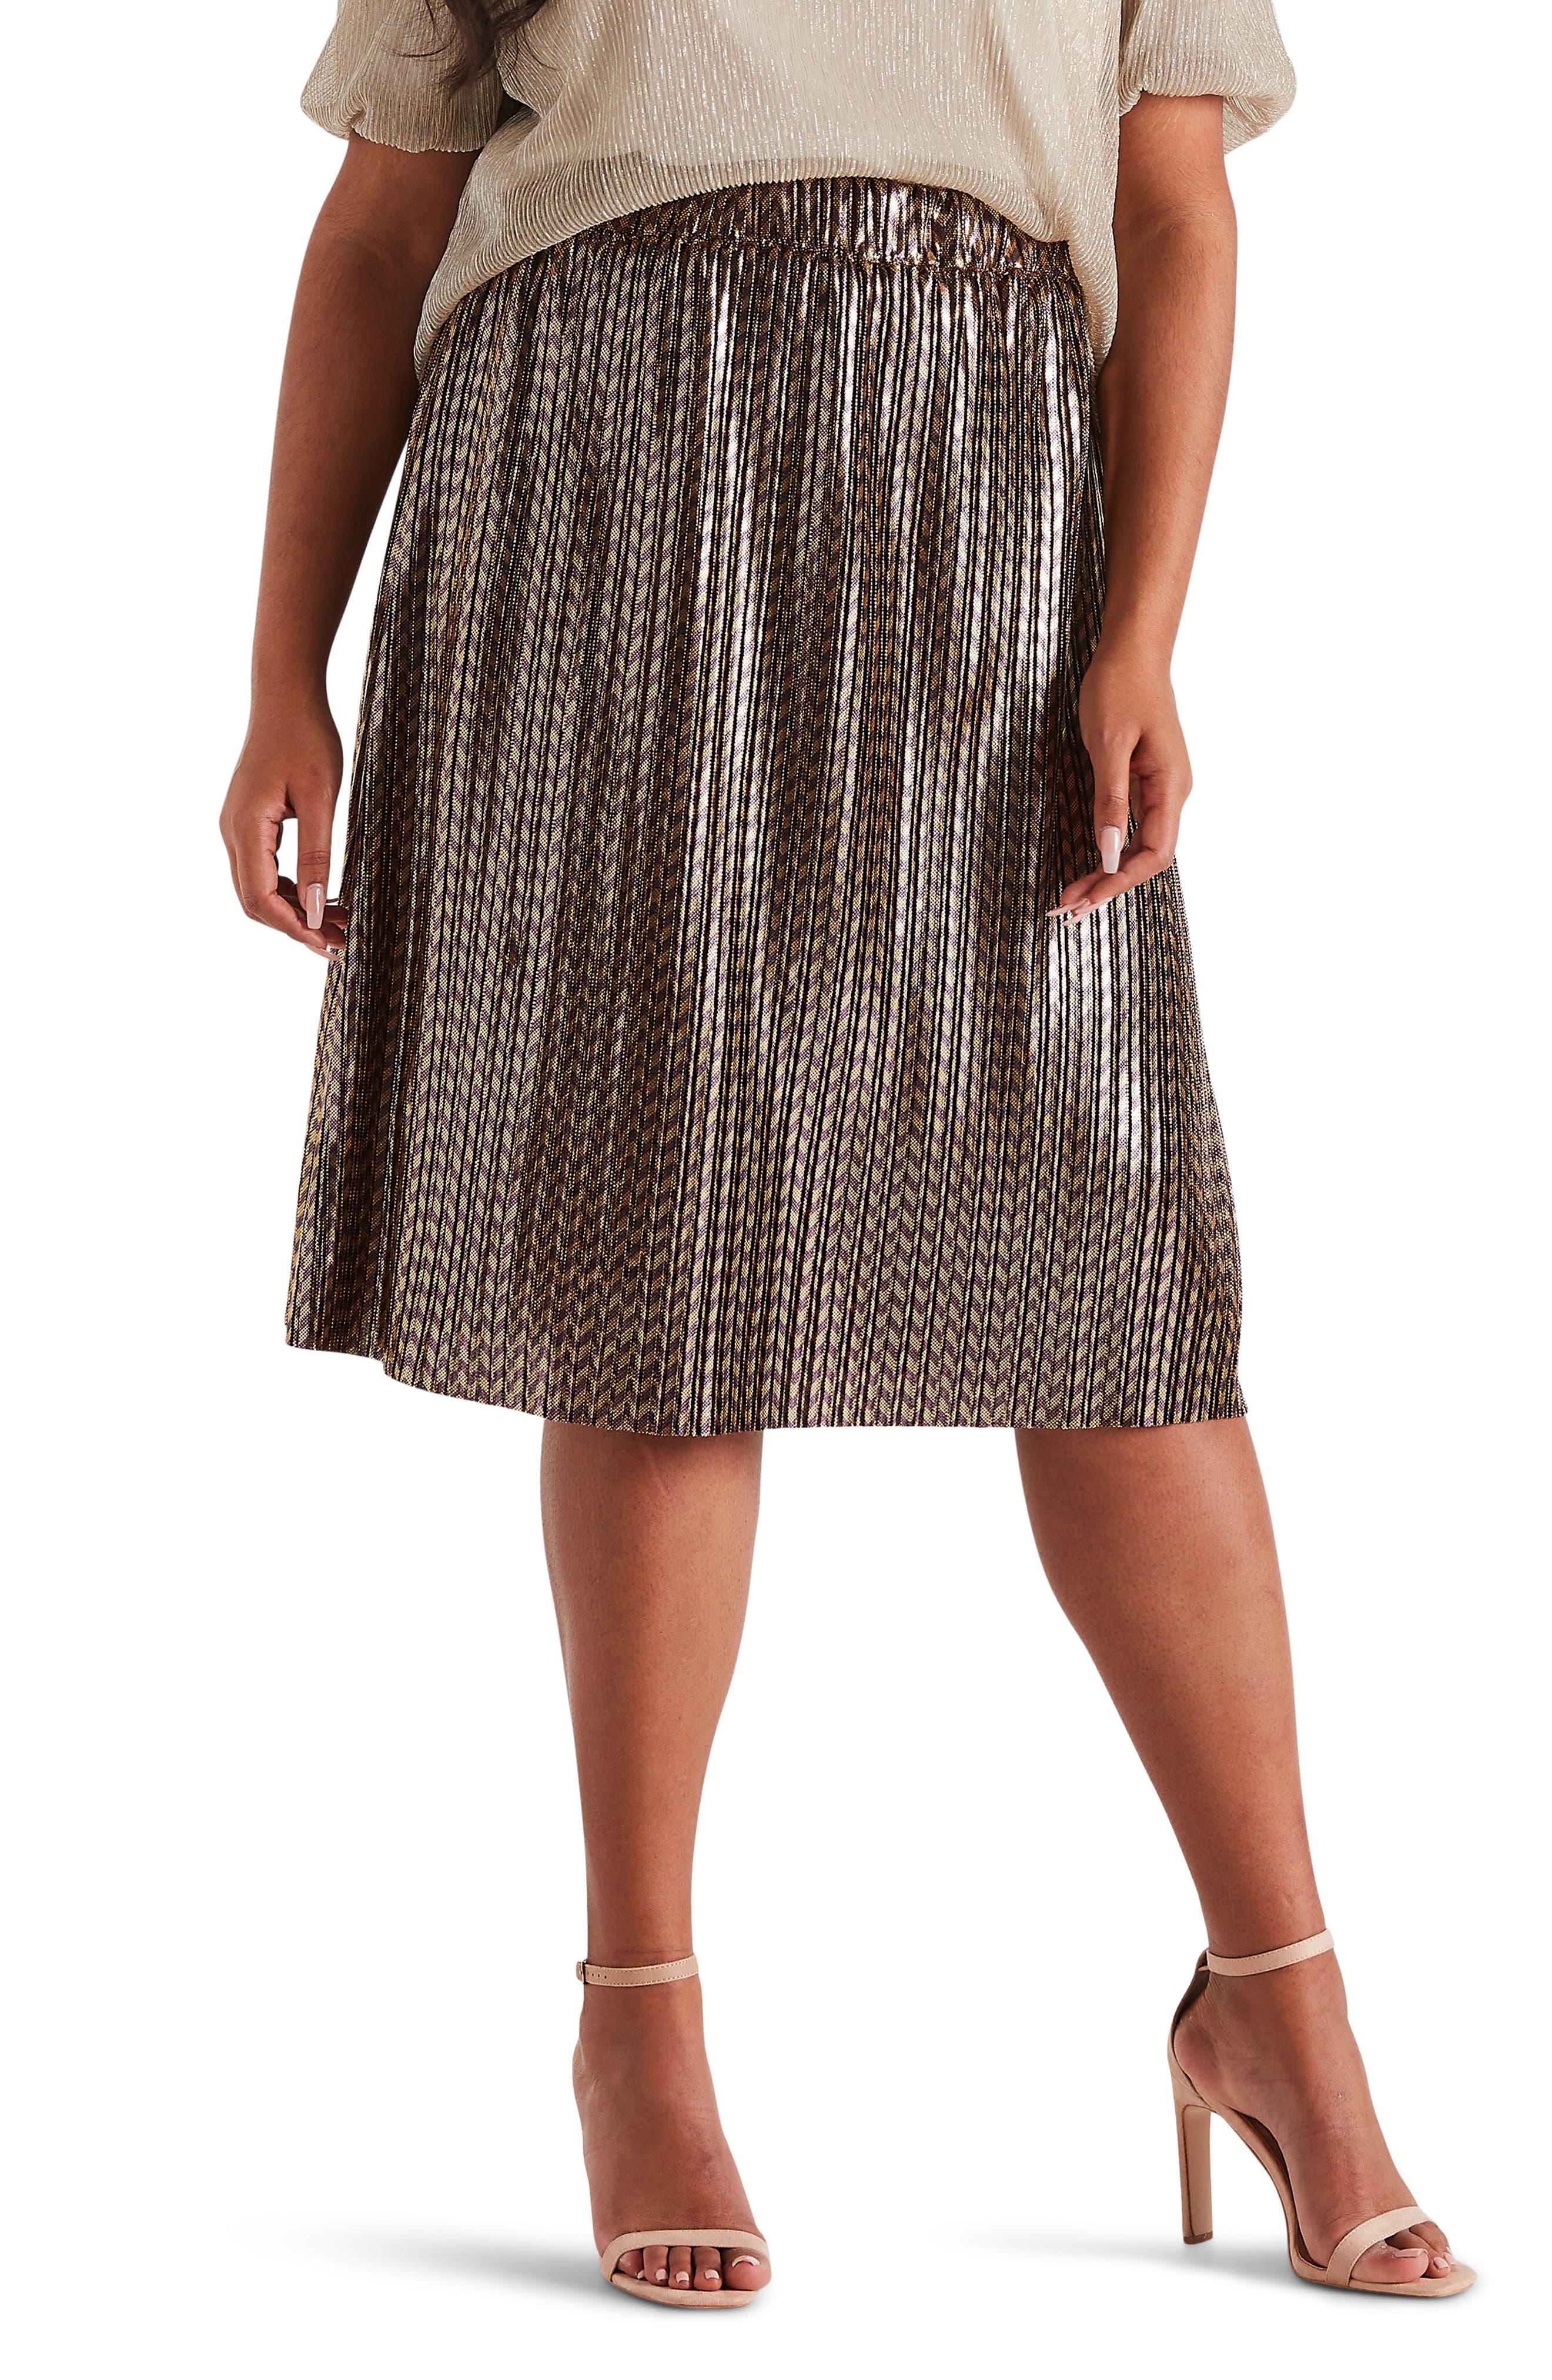 Glow Getter Skirt